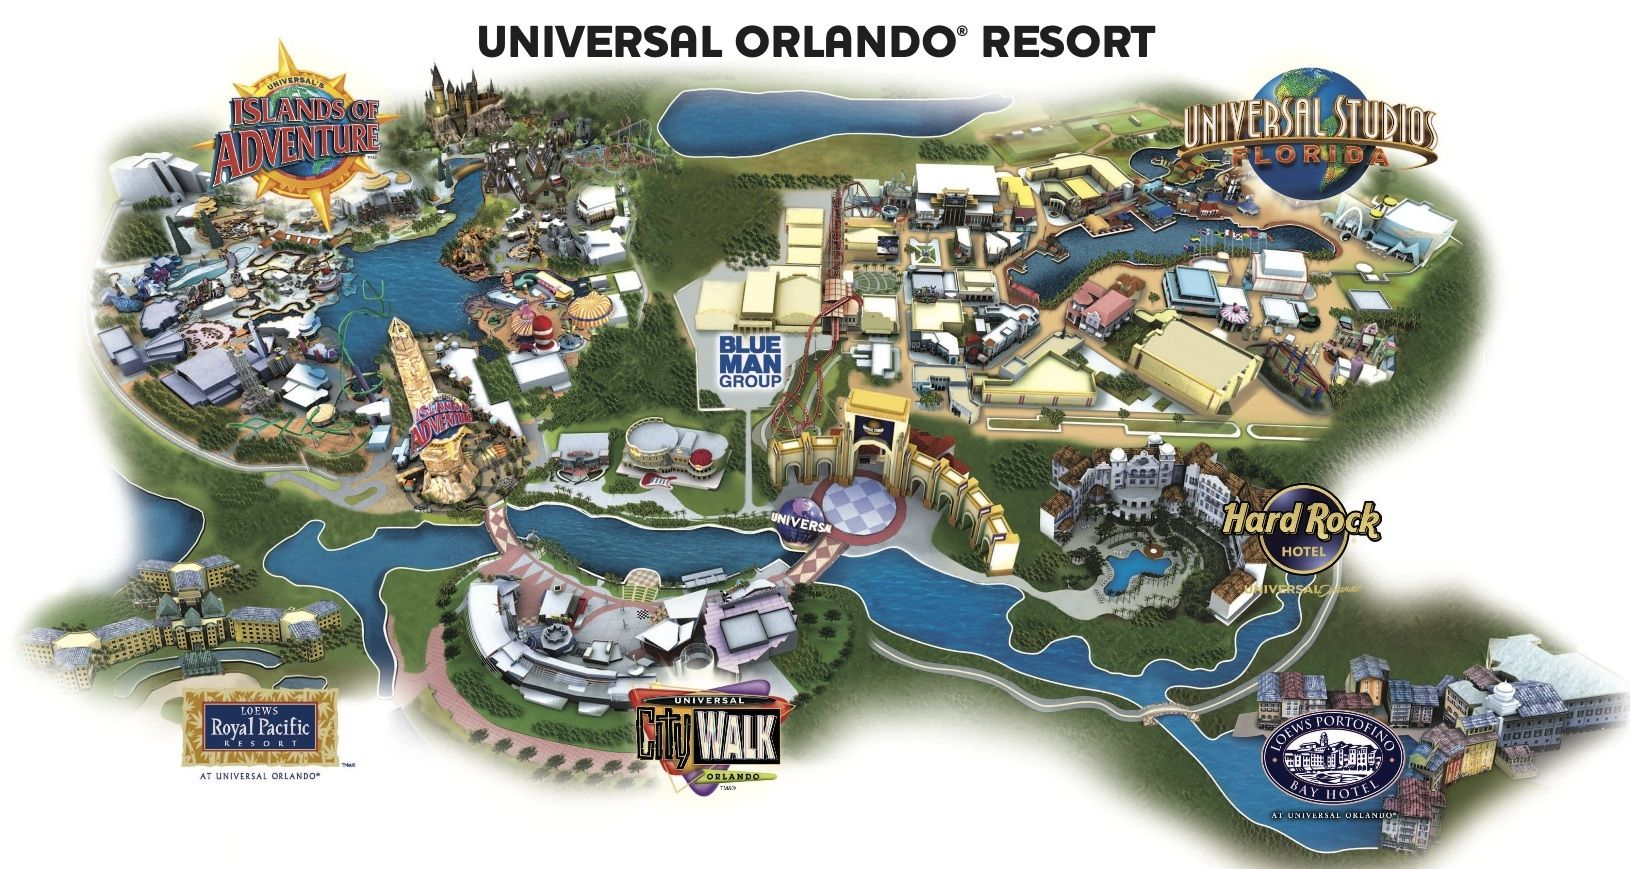 Hard Rock Hotel Universal Orlando Resort Map